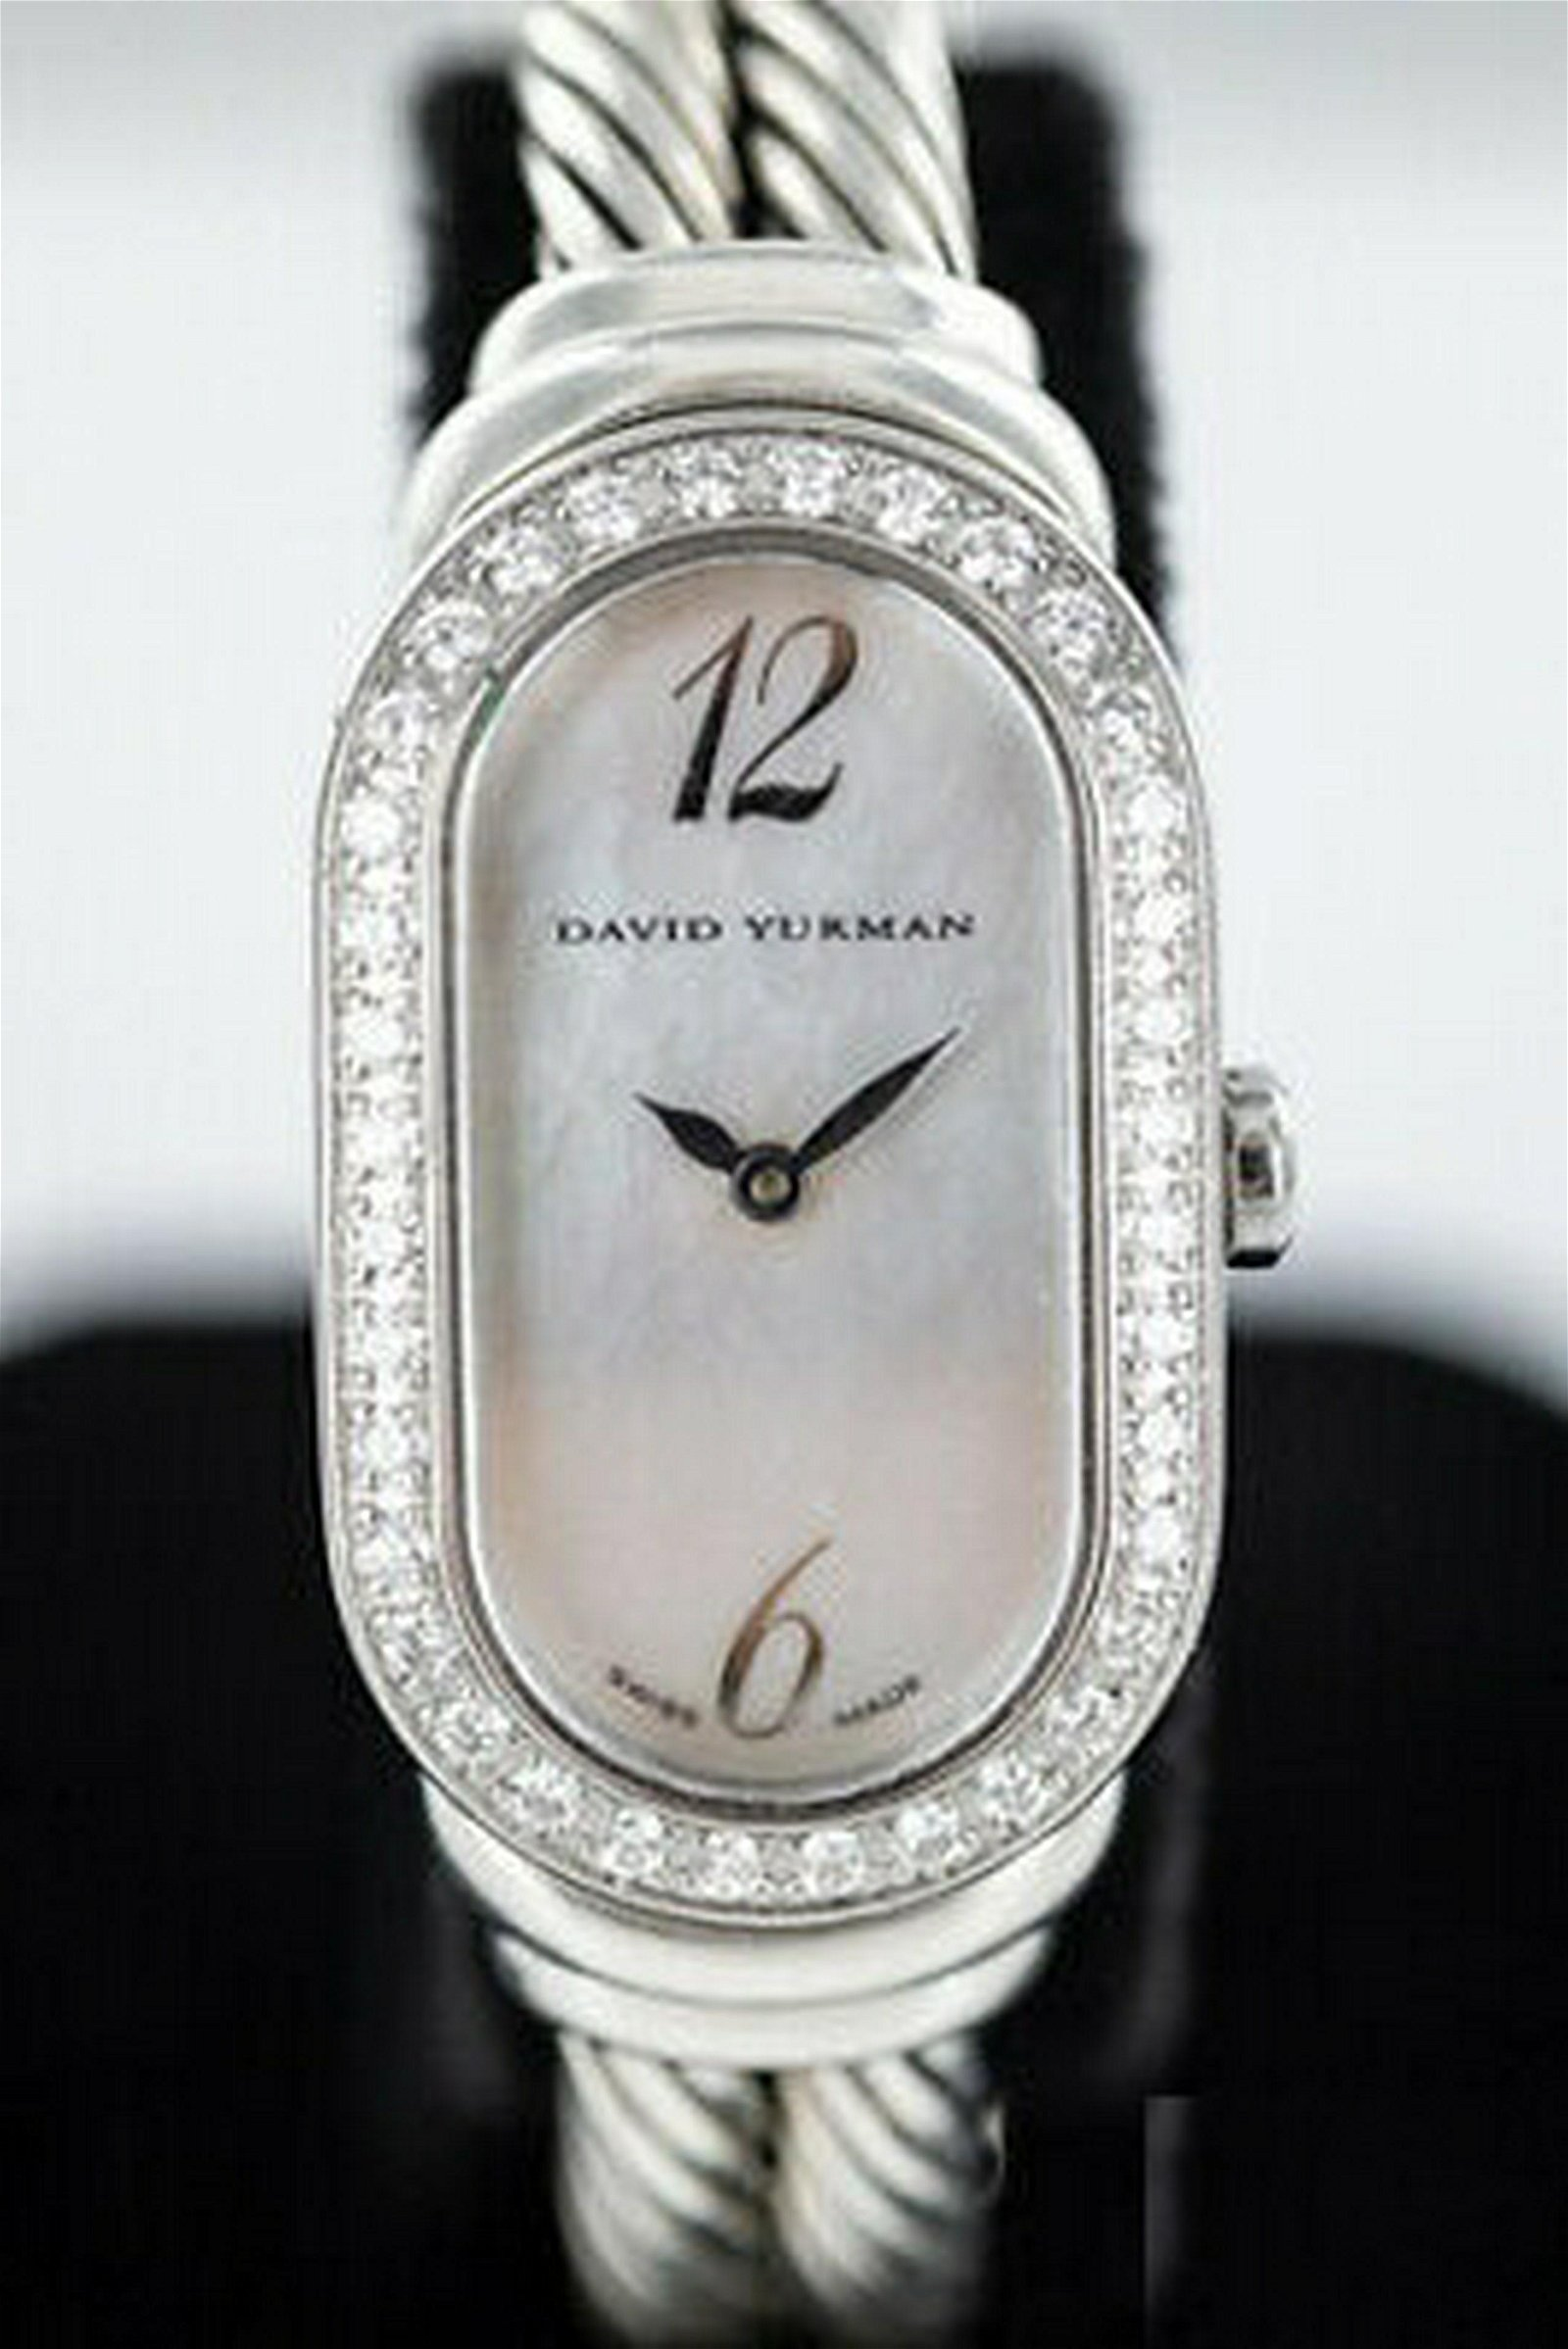 David Yurman Diamond Mother of Pearl Watch